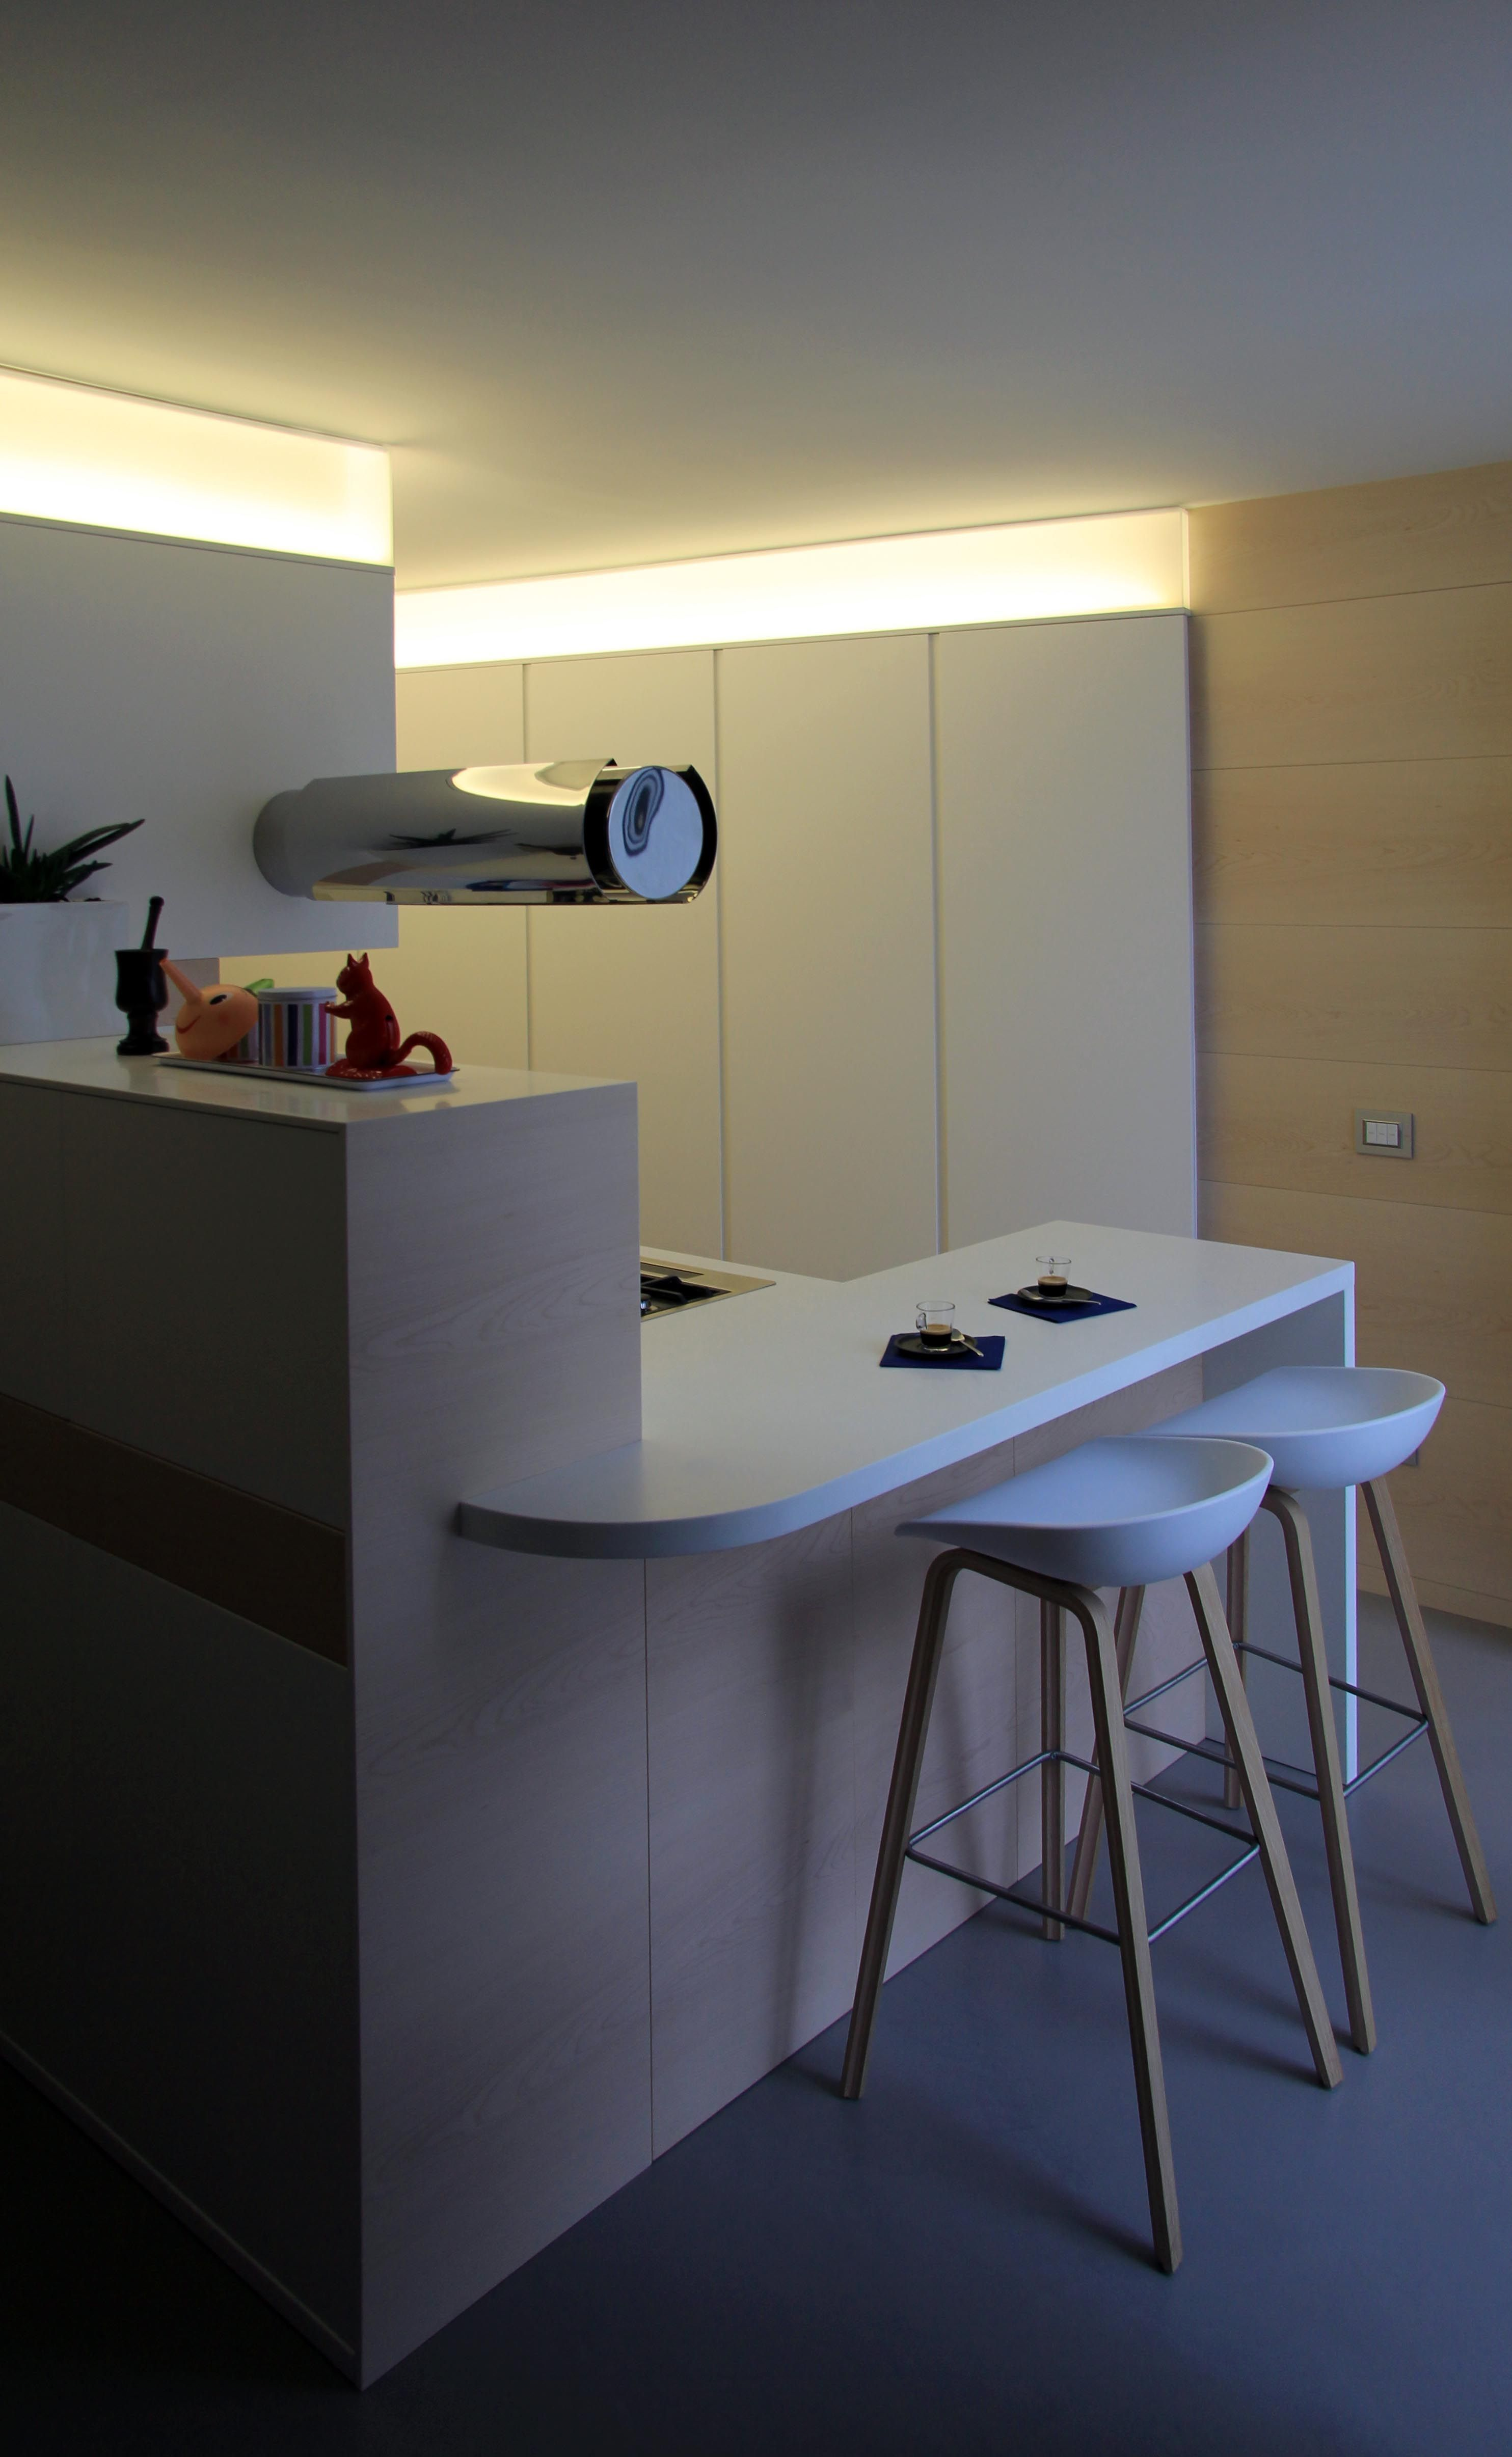 Cucina su misura cappa sospesa piano in corian - Illuminazione led cucina ...